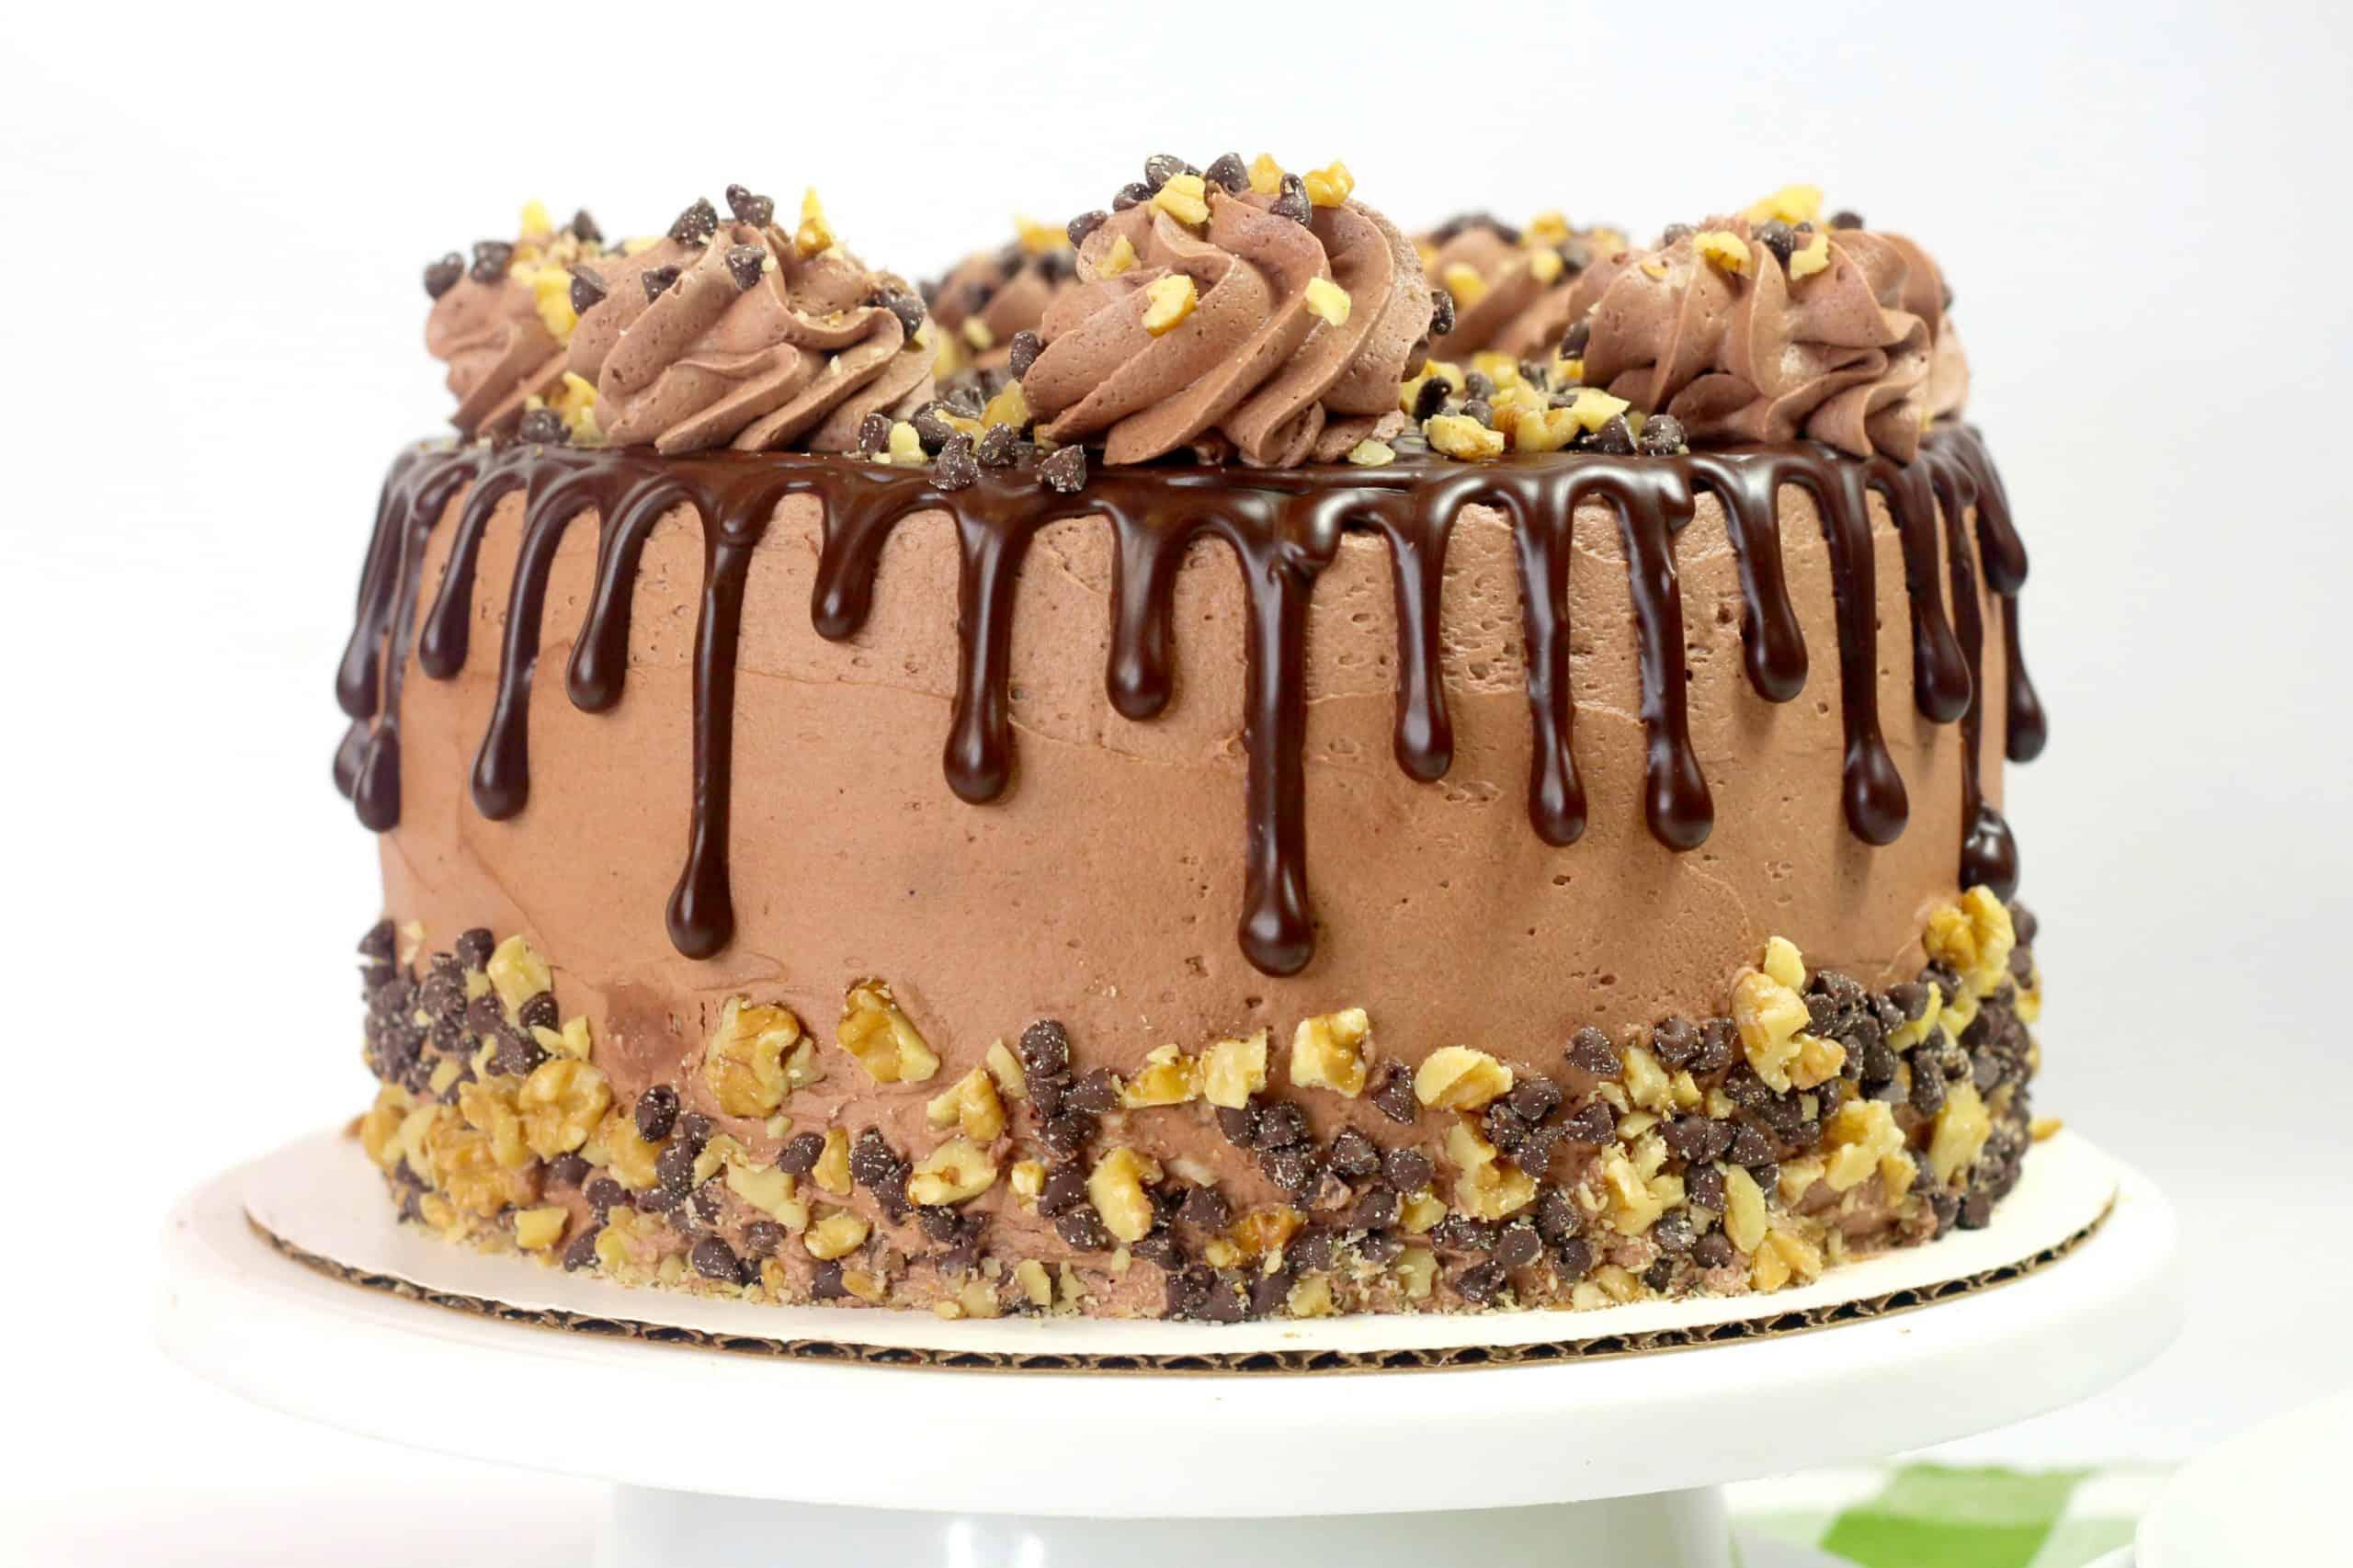 whole chocolate fudge cake on a cake board